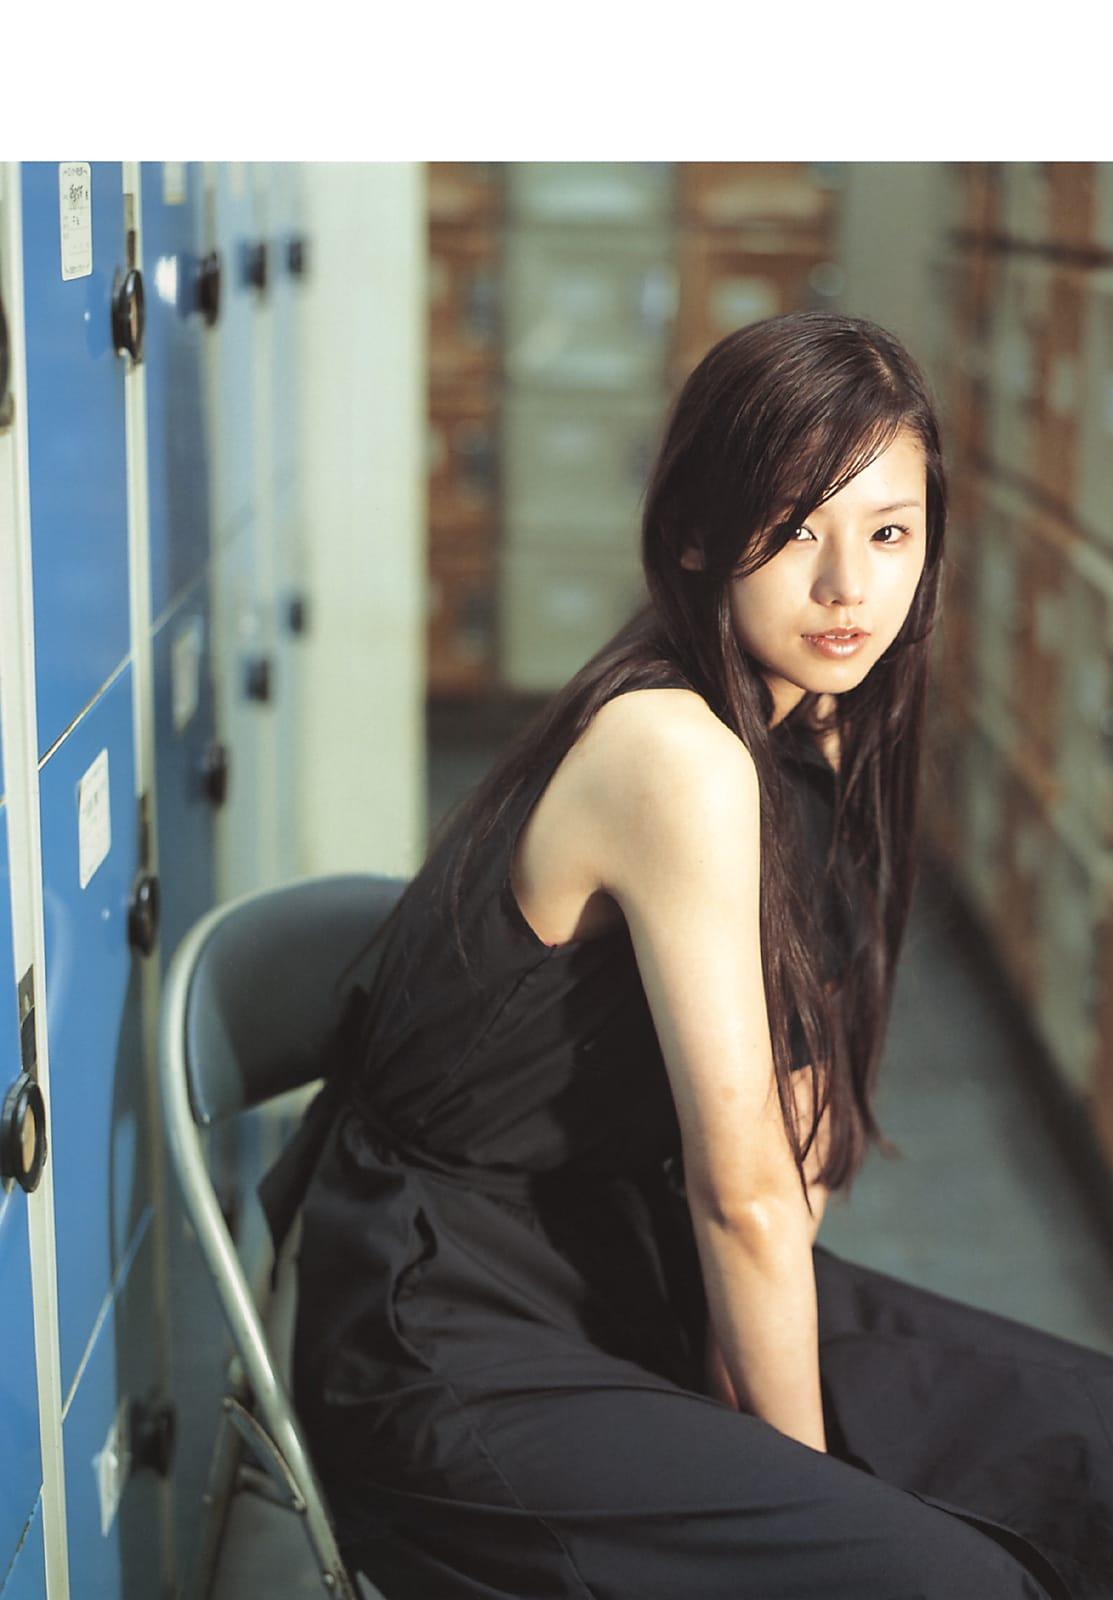 Manami Konishi nude photos 2019